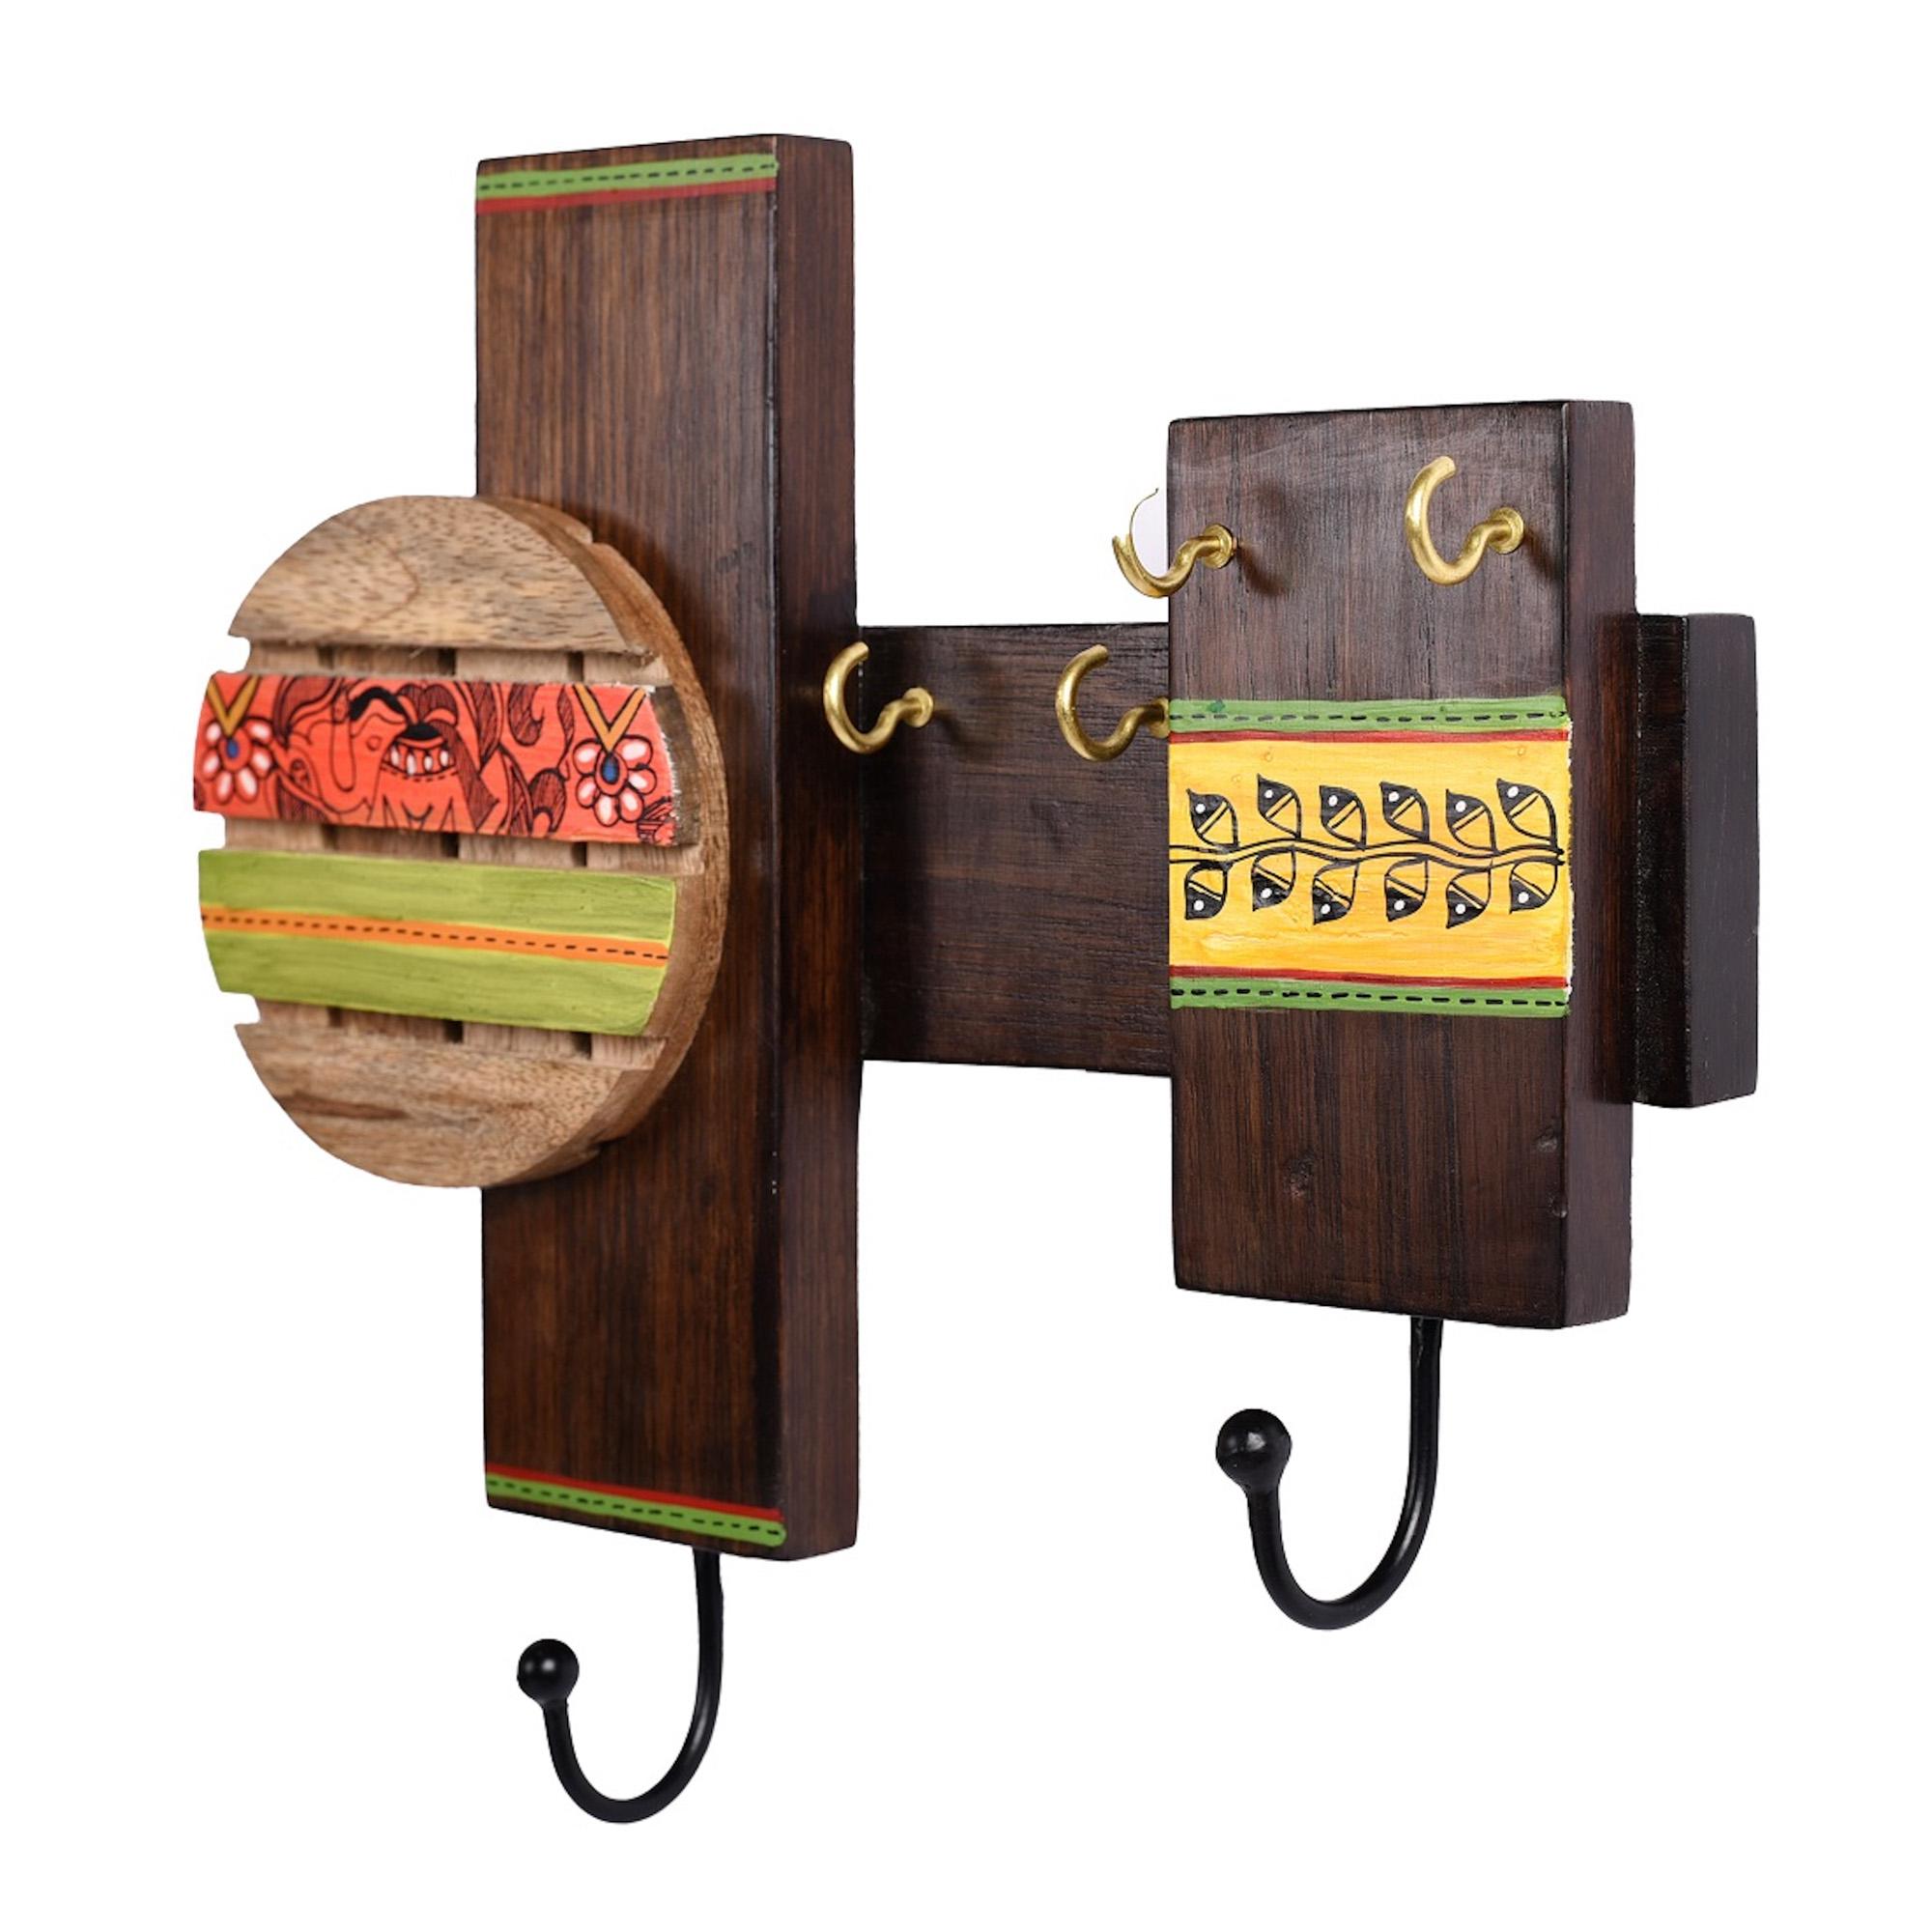 Unique Key Stand Designs